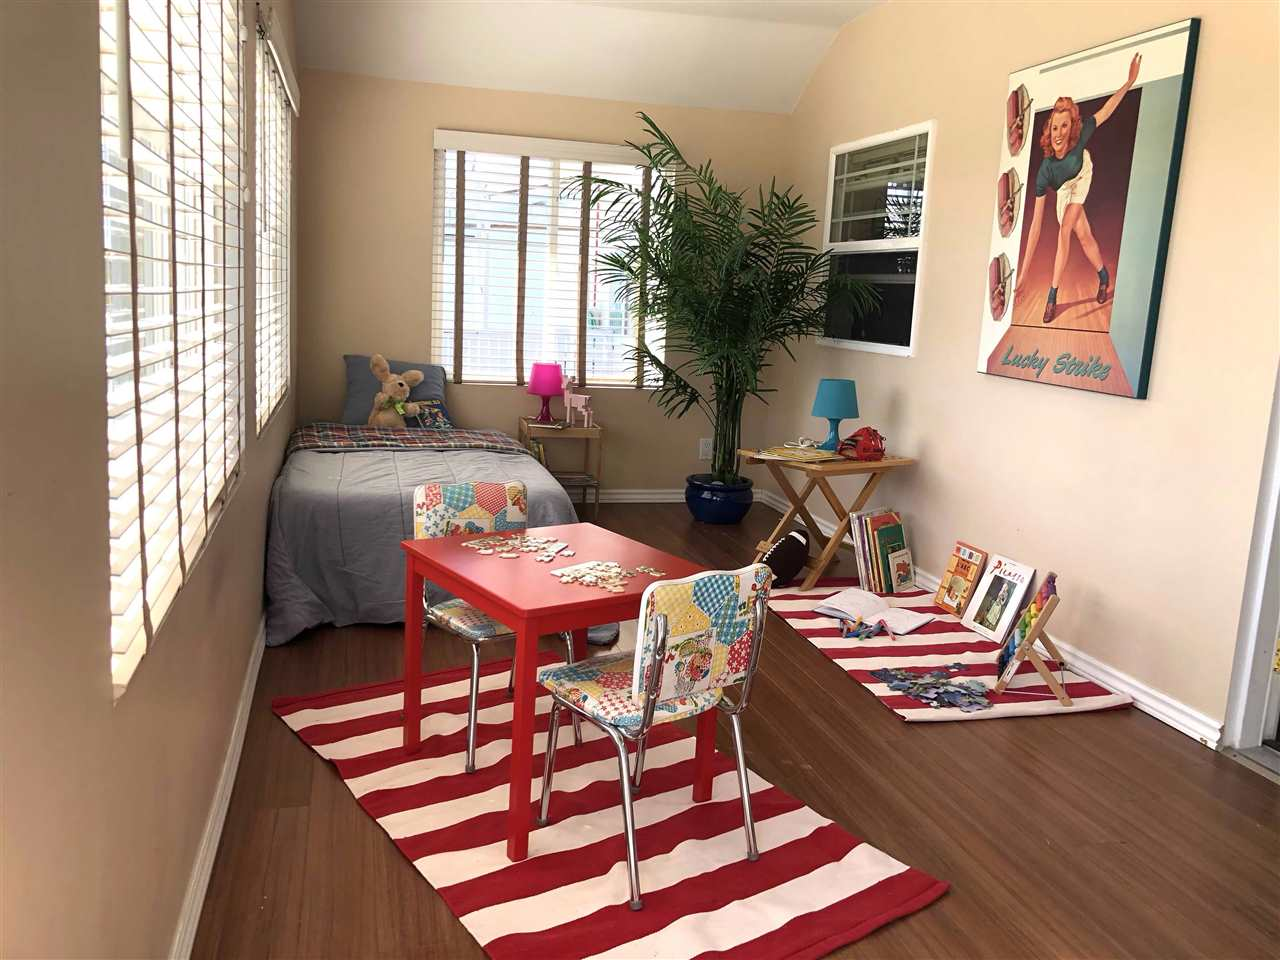 2684 TURNER STREET - Hastings Sunrise House/Single Family for sale, 5 Bedrooms (R2497817) - #9